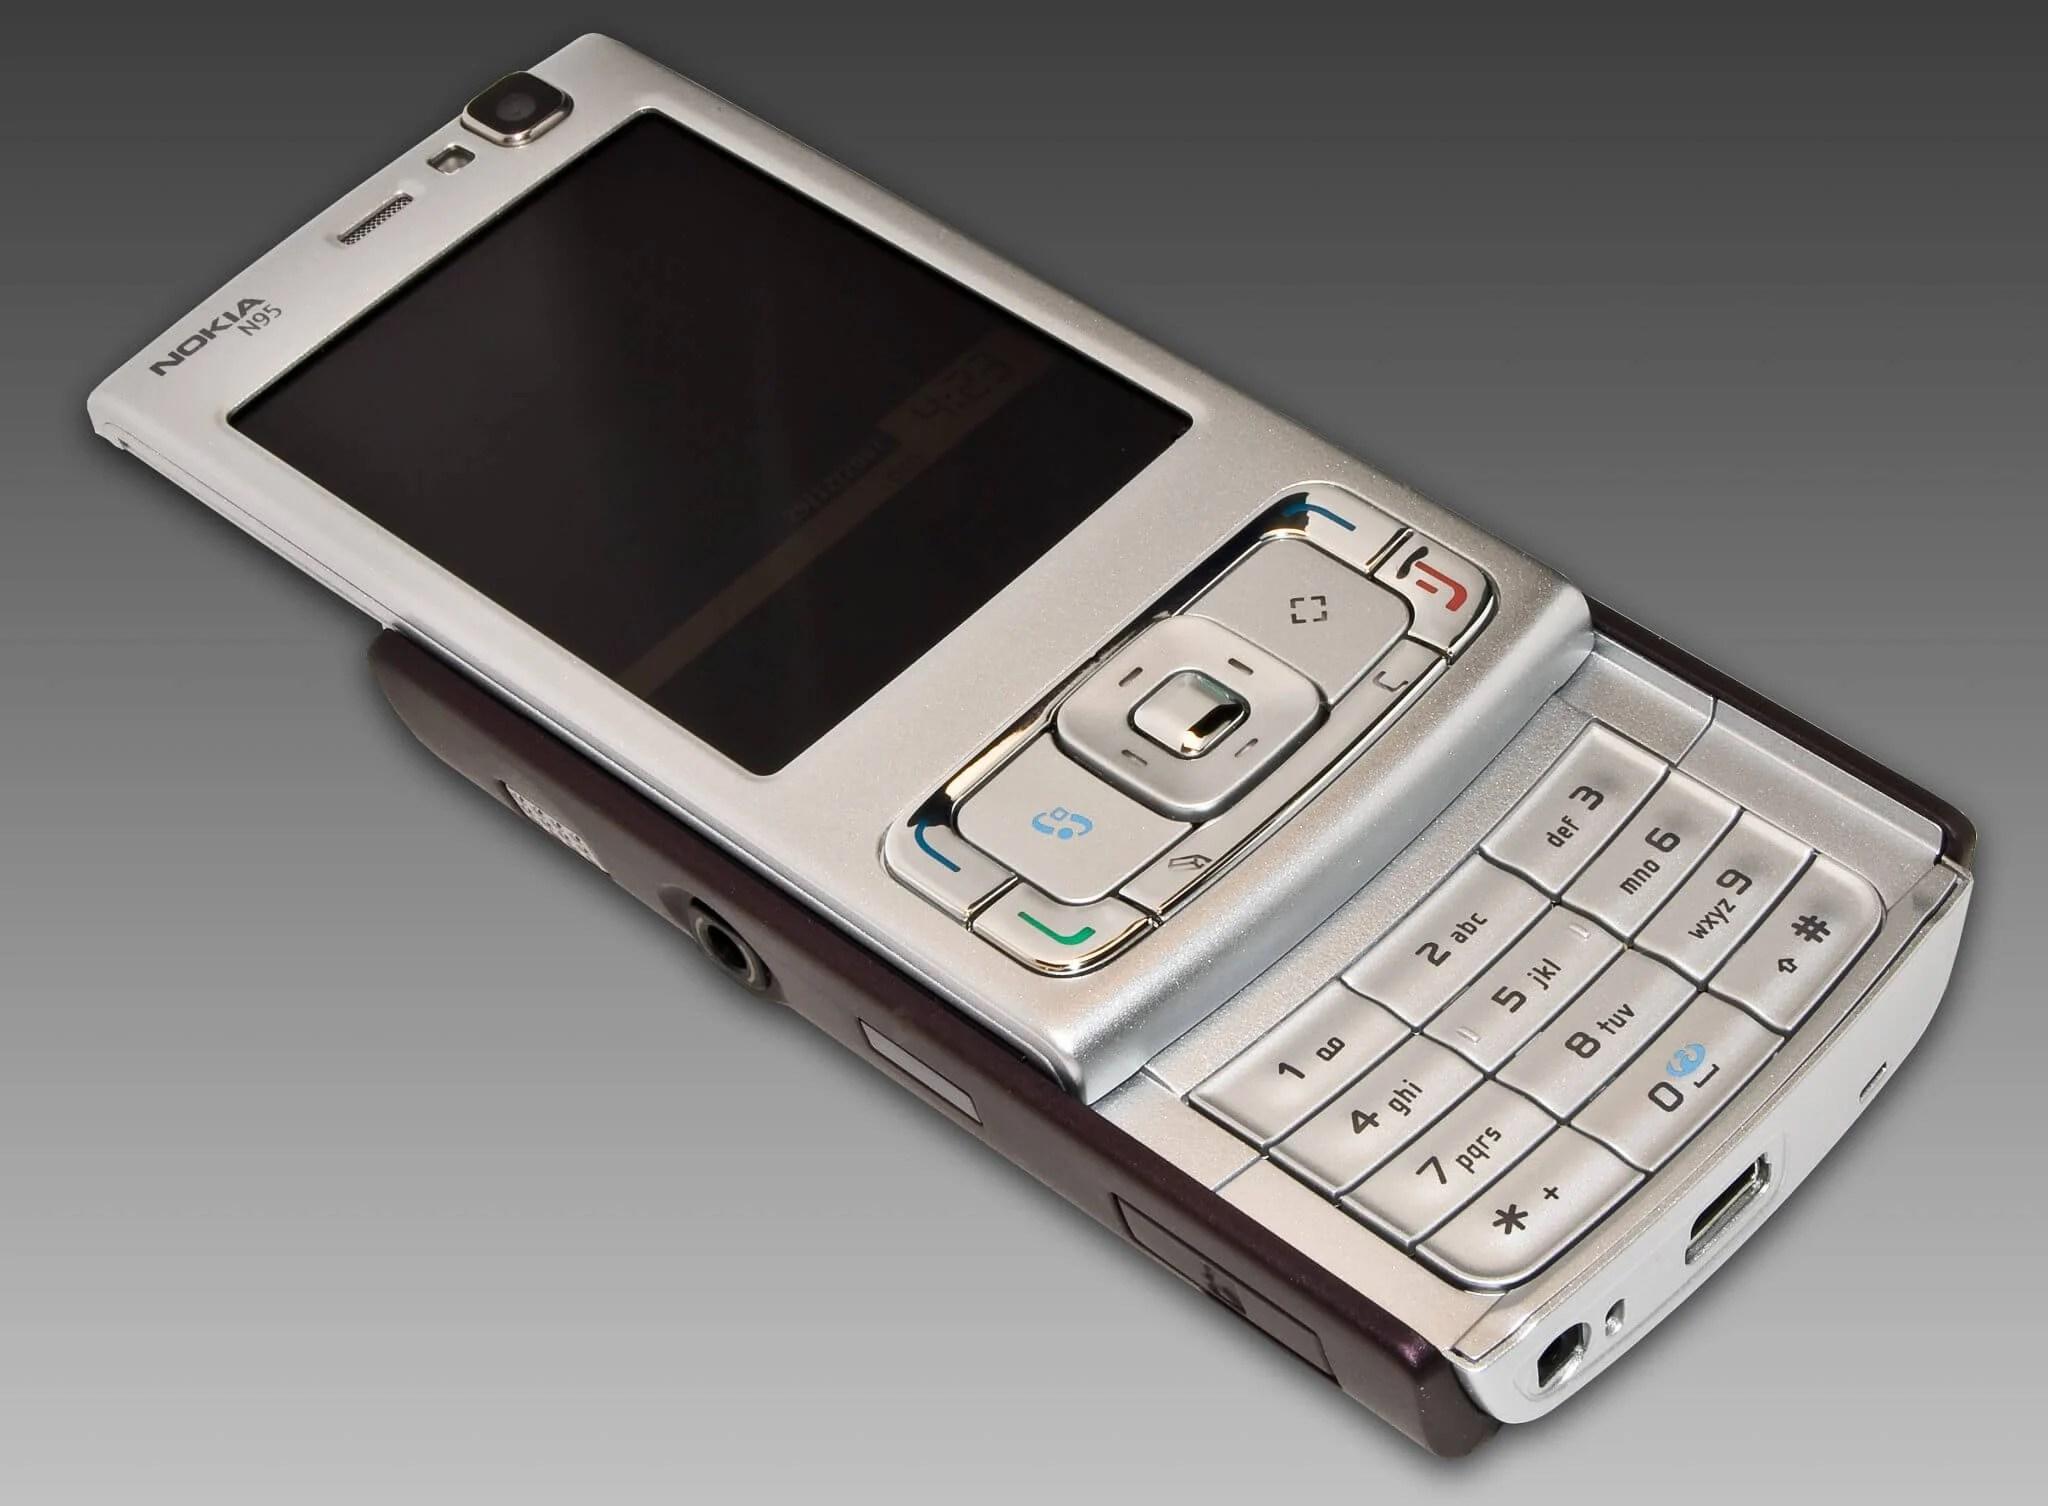 N95 Front slide open - Nokia N95 completa 10 anos